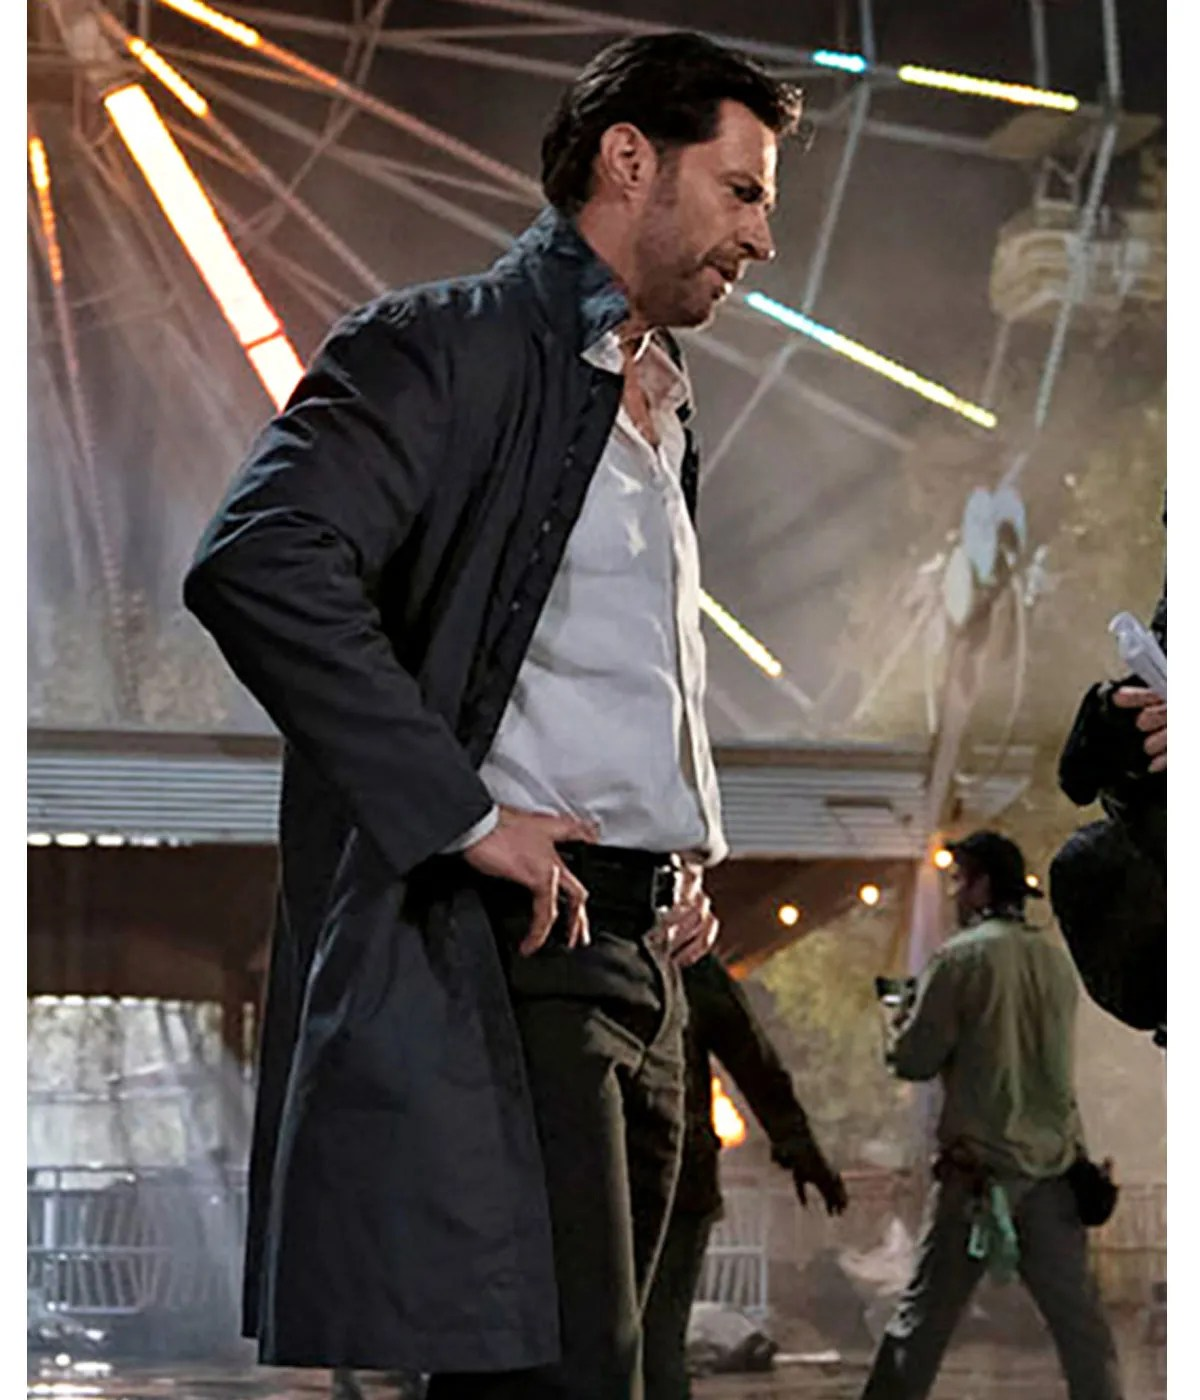 hugh-jackman-bannister-reminiscence-coat